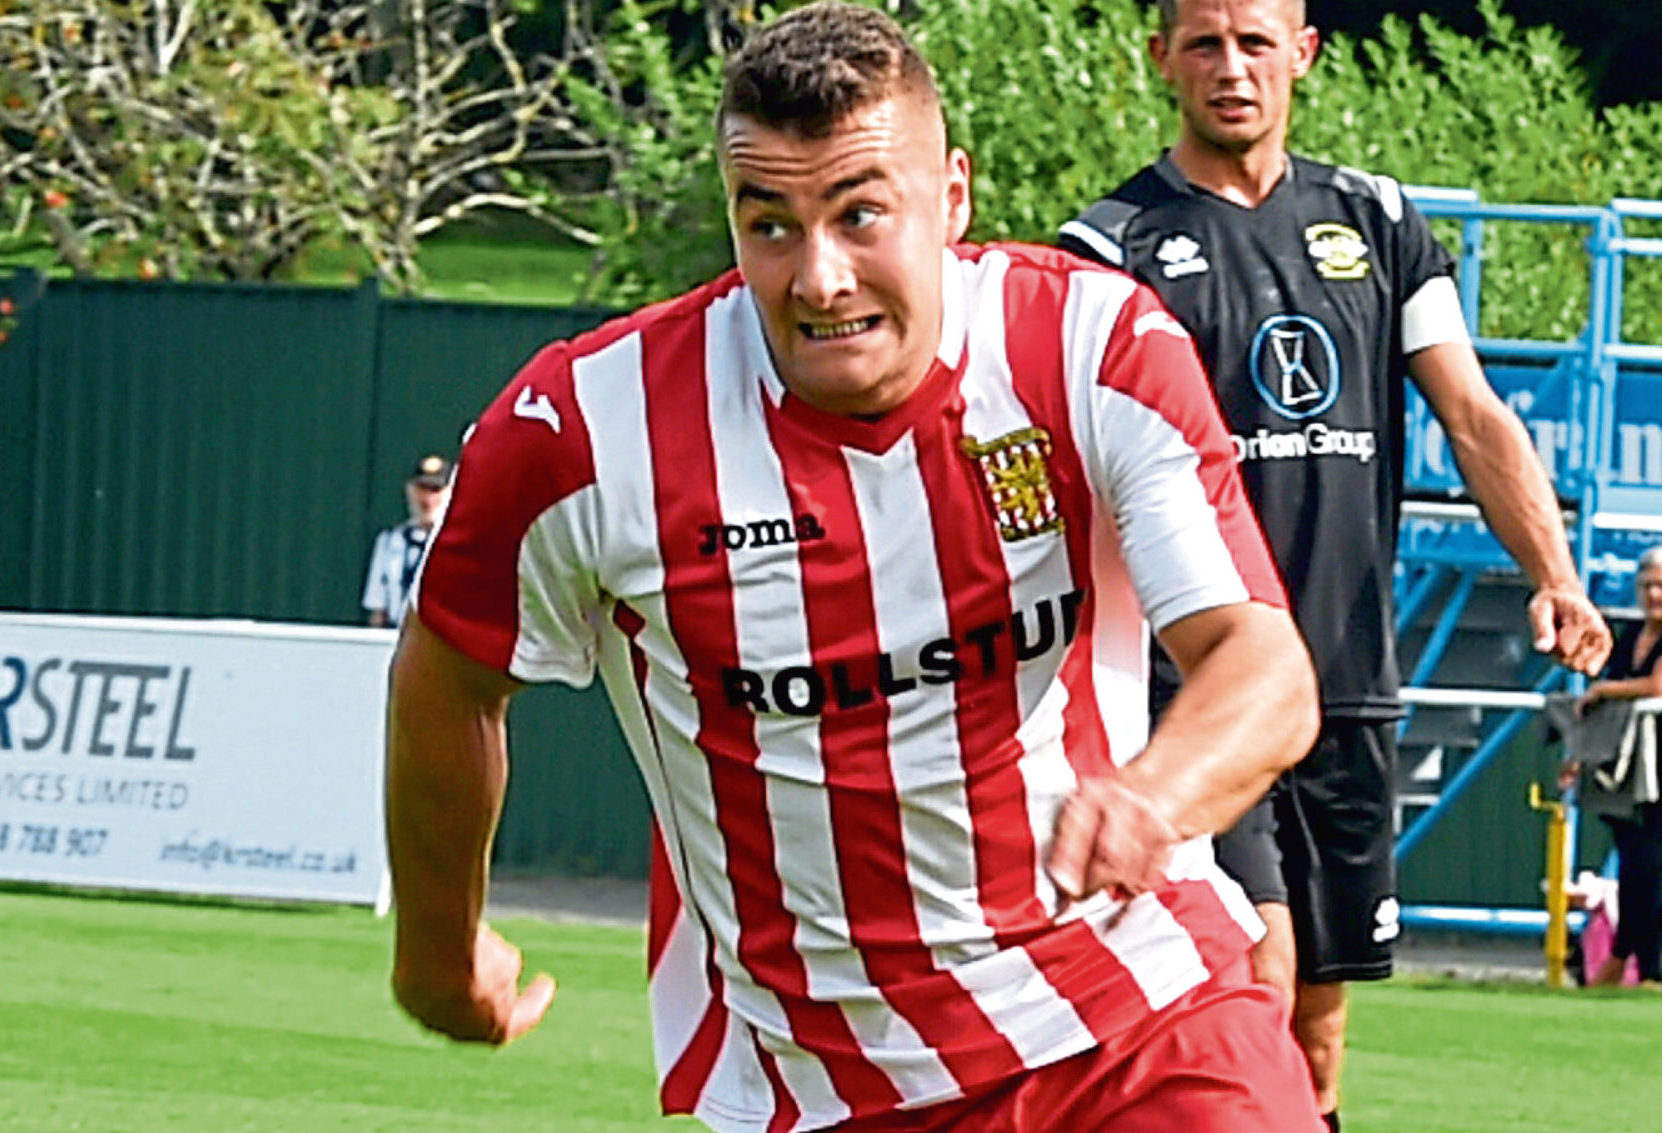 Formartine United's Scott Lisle